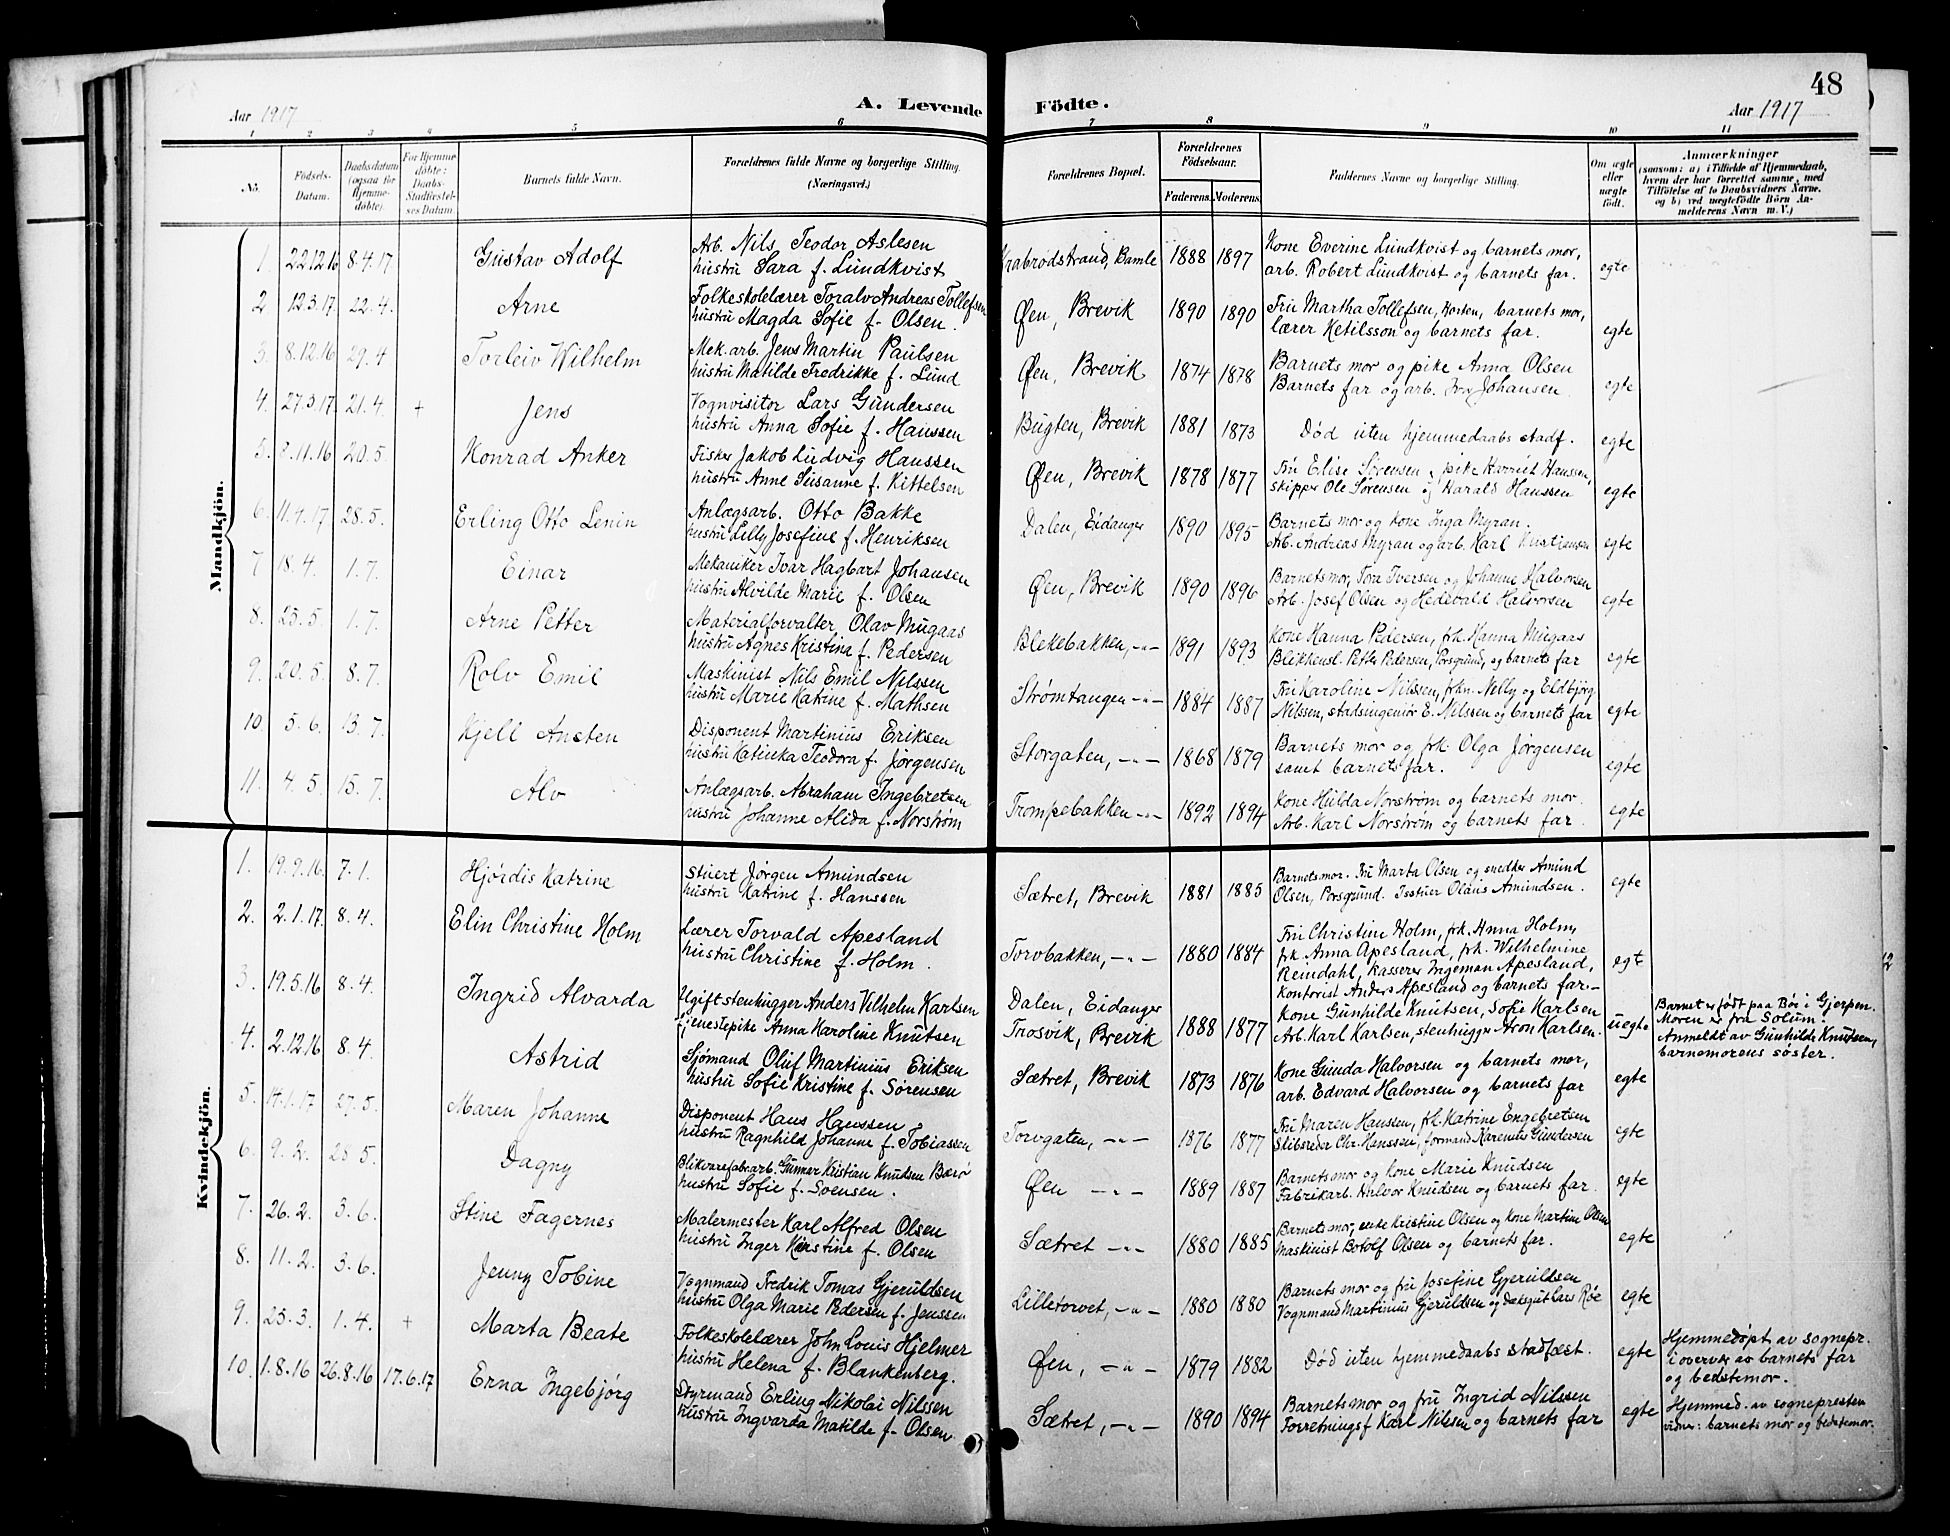 SAKO, Brevik kirkebøker, G/Ga/L0005: Klokkerbok nr. 5, 1901-1924, s. 48